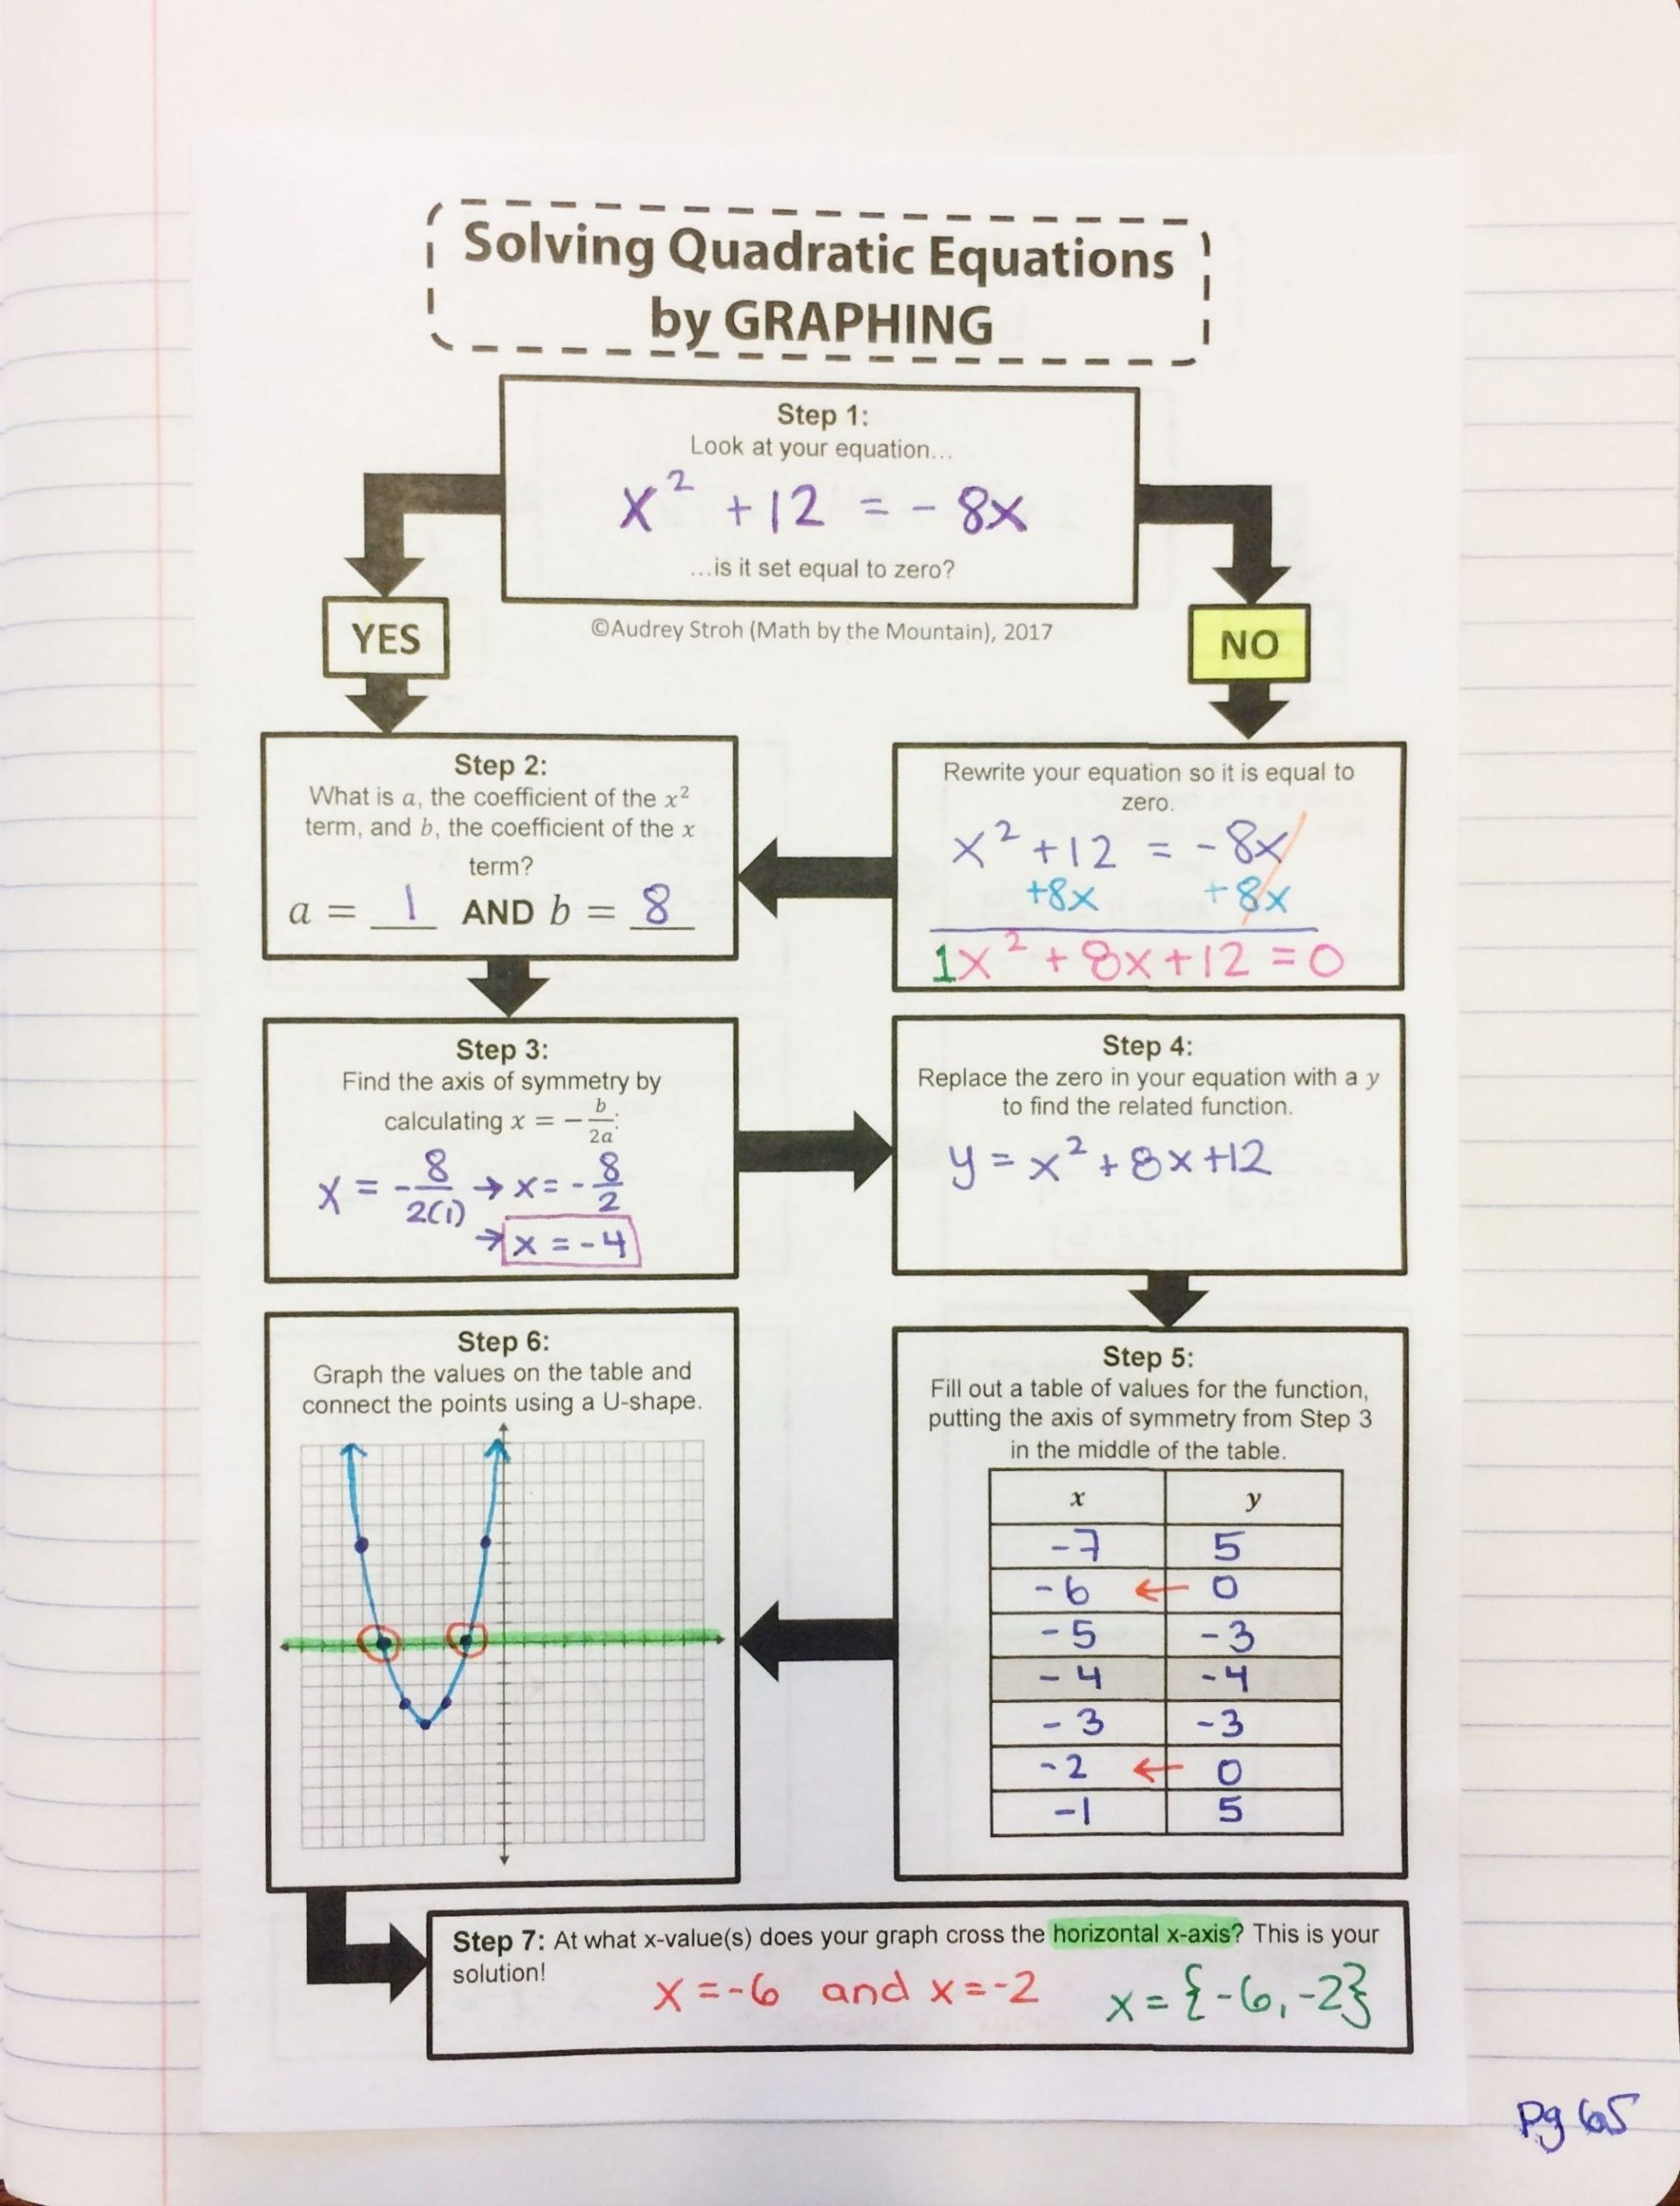 Quadratic Functions Worksheet With Answers Solving Quadratic Equations By Graphing Flowchart Graphic In 2020 Solving Quadratic Equations Solving Quadratics Quadratics